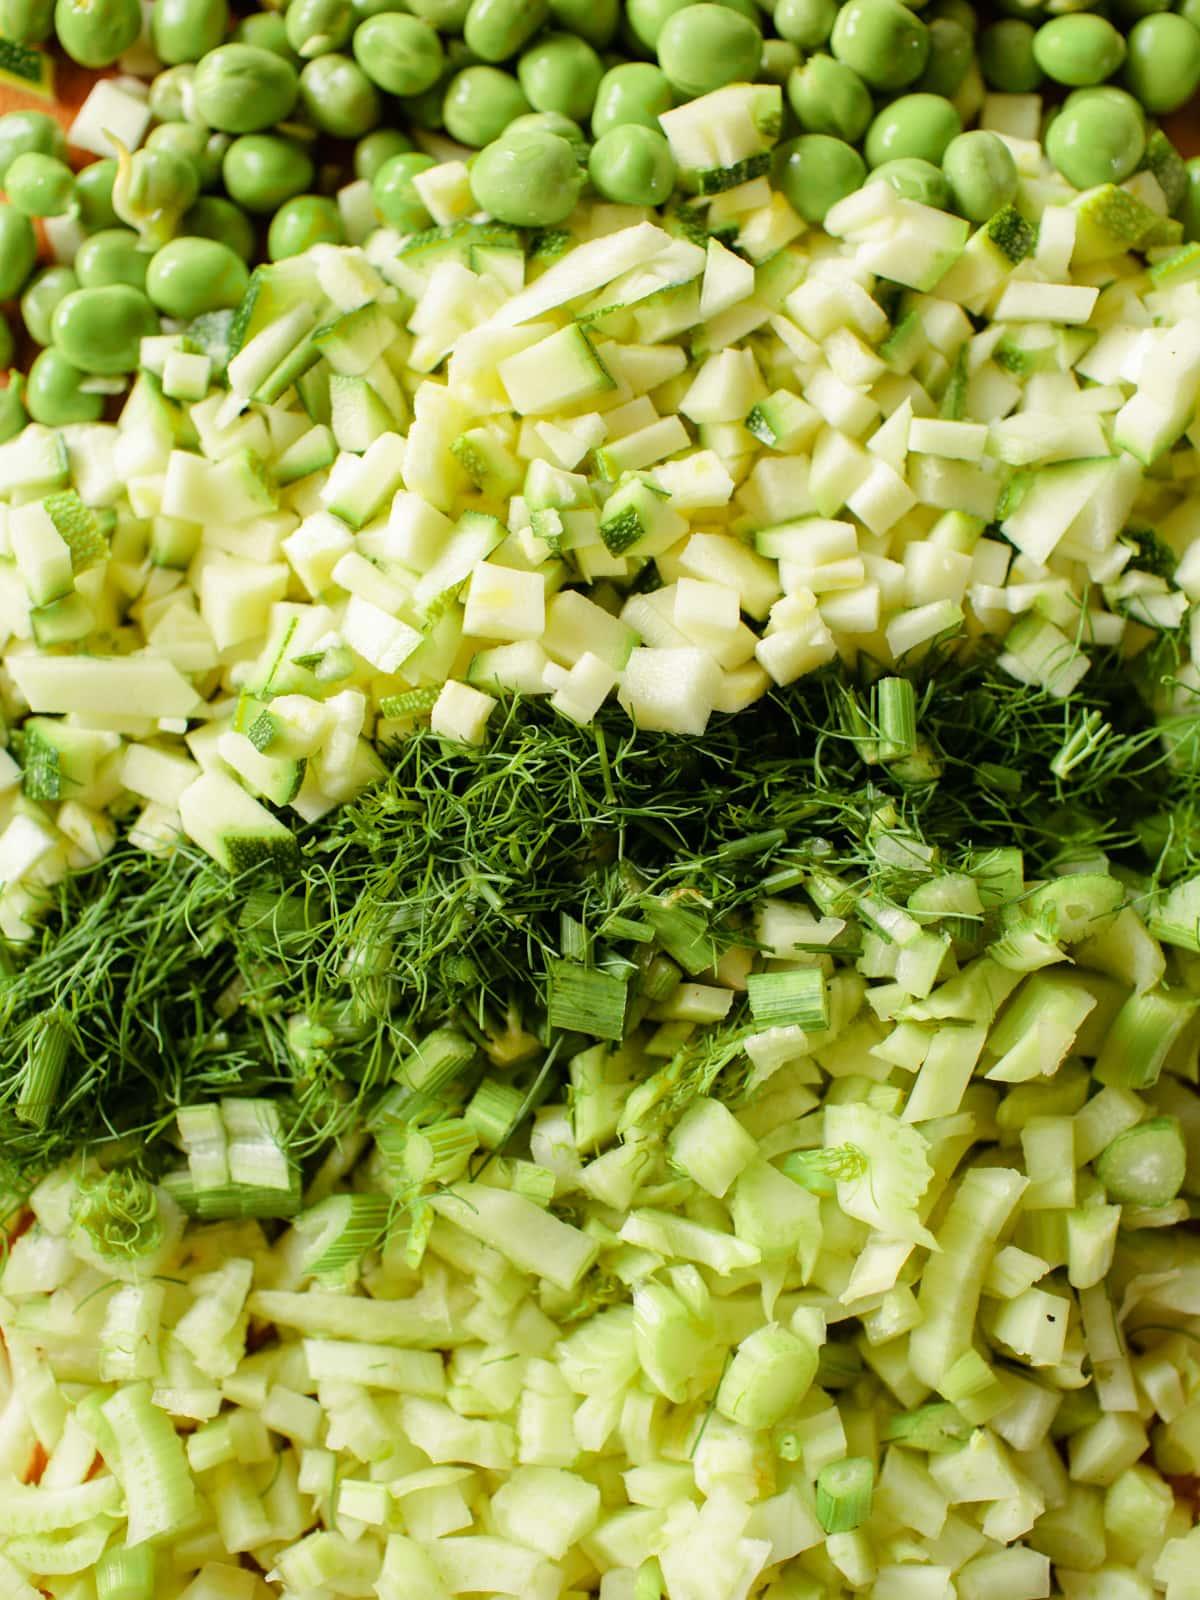 gemüse in kleine würfel geschnitten